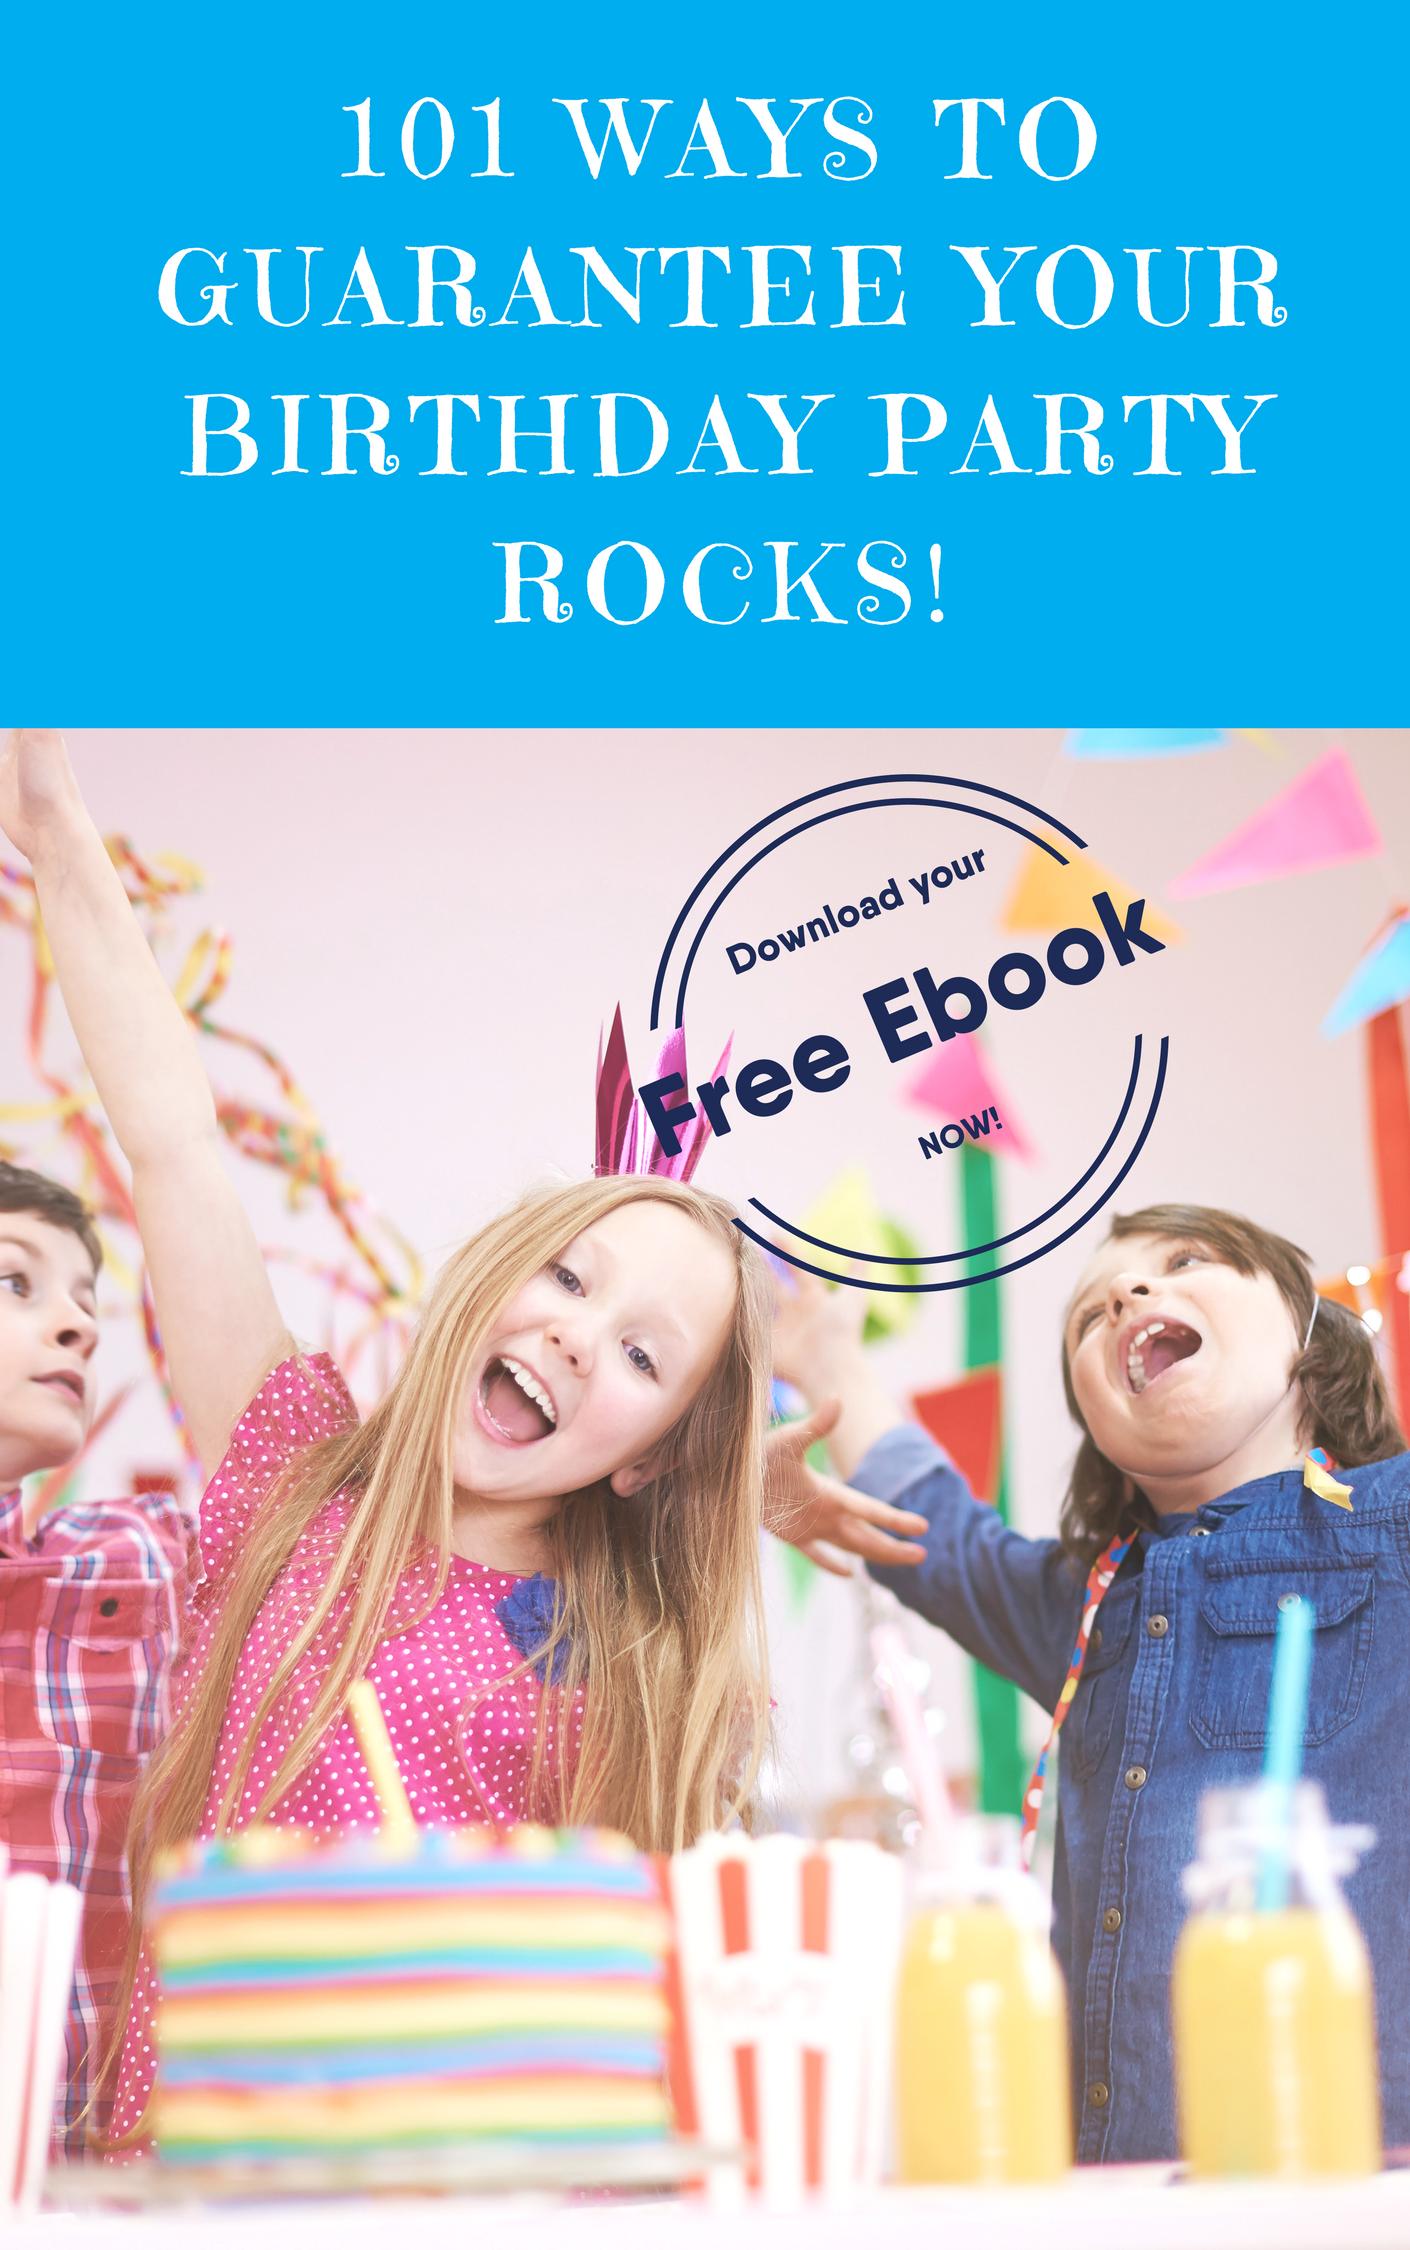 101 ways to GUARANTEEyour birthday party rocks! (1).png